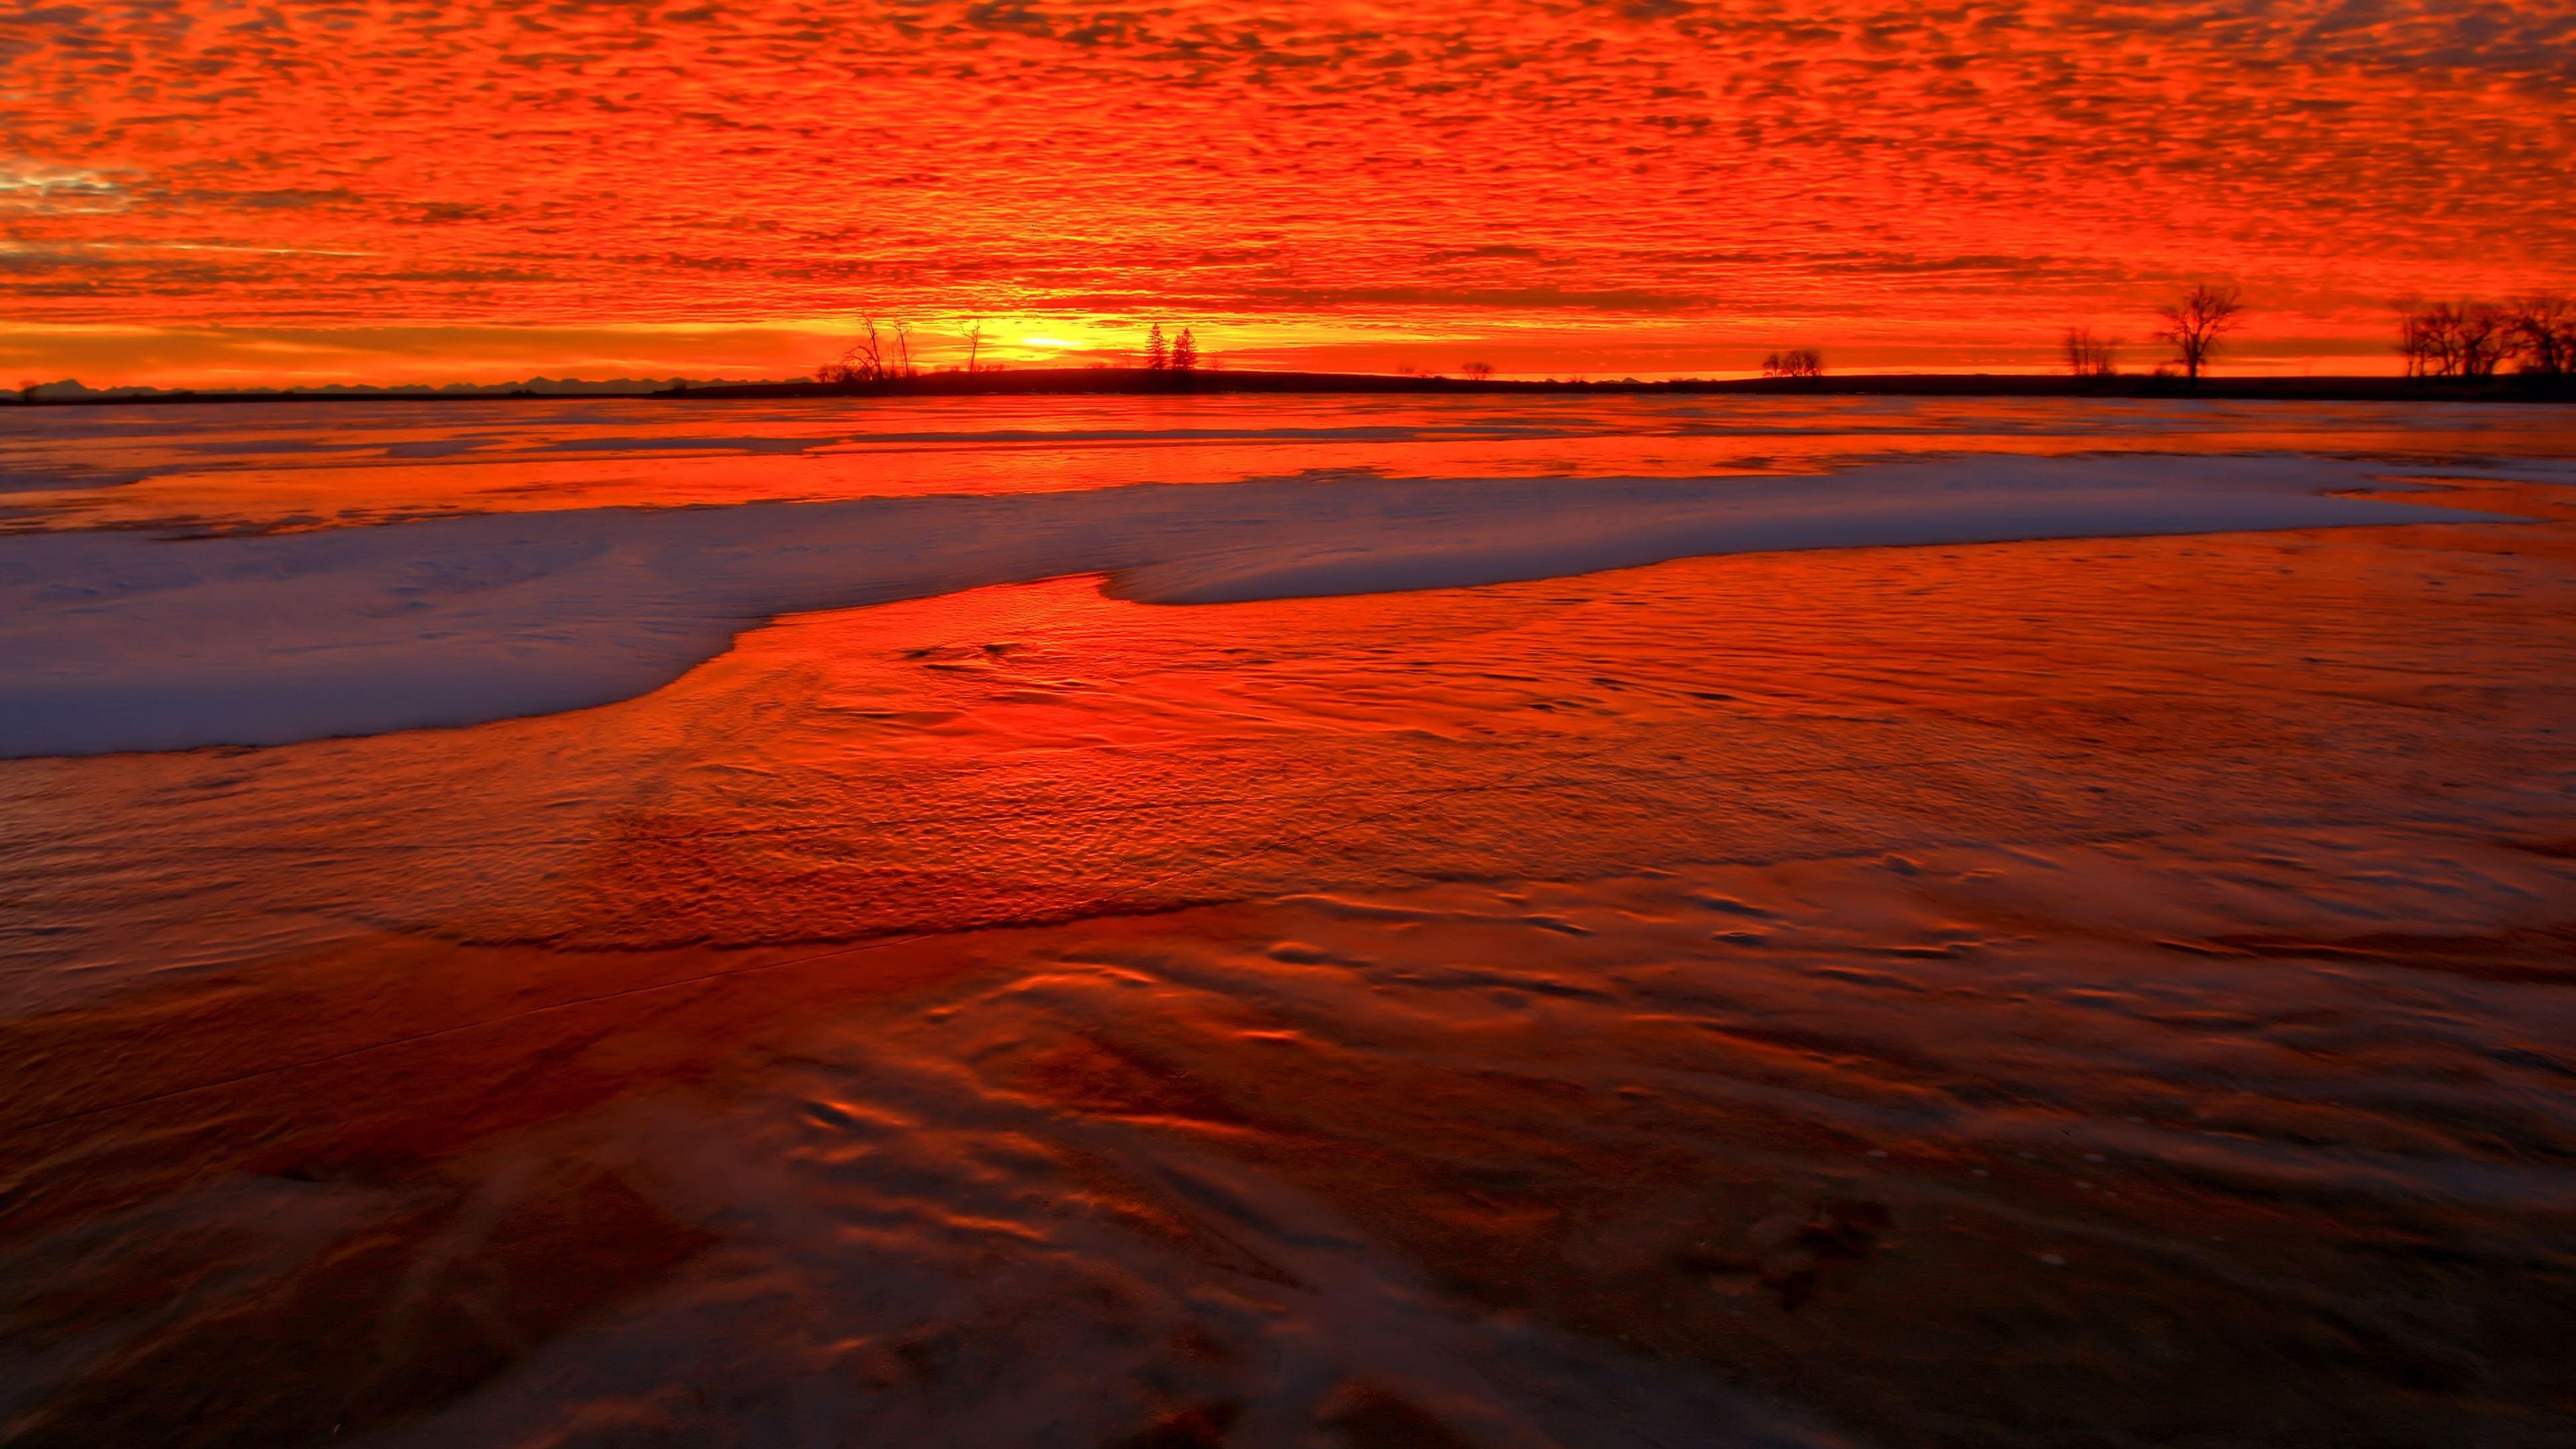 red paisagem 1551644204 - Red Paisagem - sunset wallpapers, red wallpapers, hd-wallpapers, dark wallpapers, 4k-wallpapers